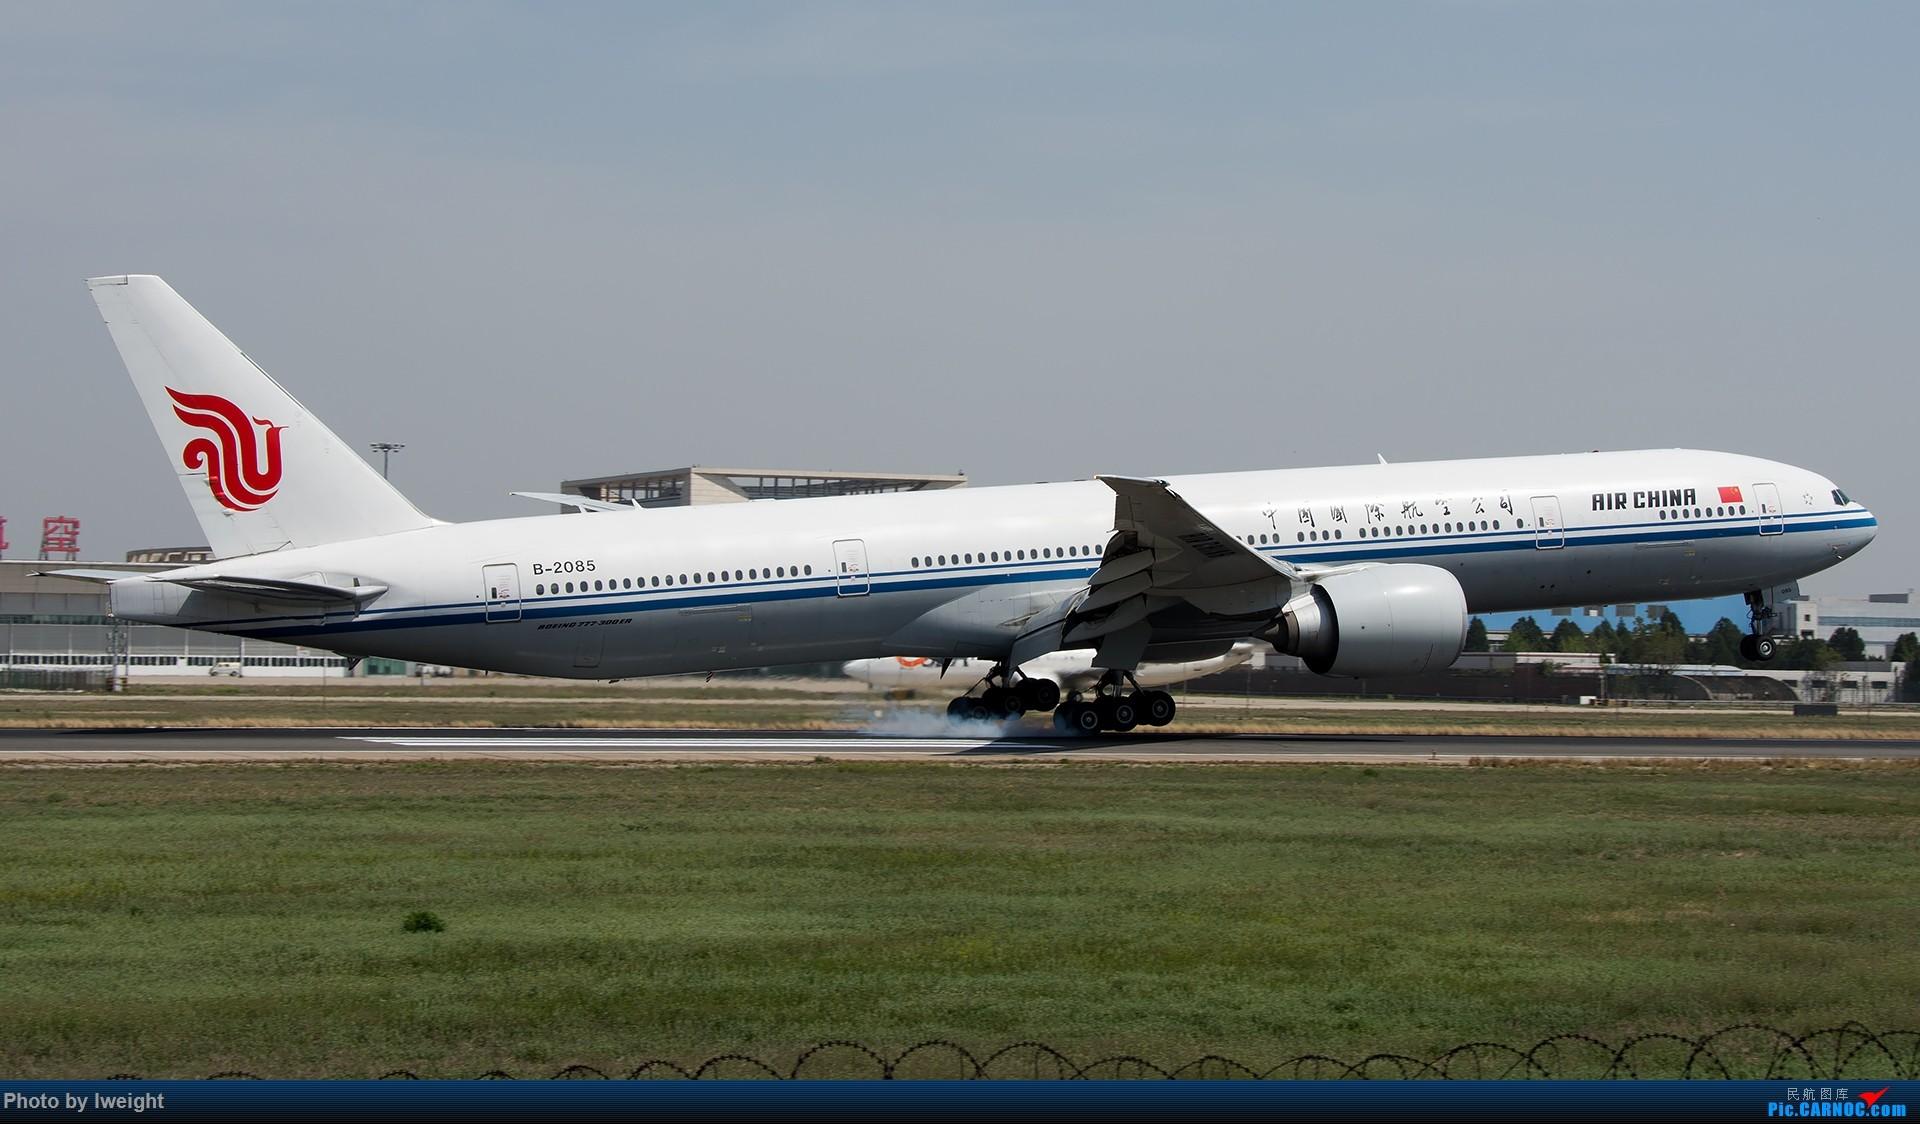 Re:[原创]天气晴朗,继续守候18R【多图】 BOEING 777-300ER B-2085 中国北京首都国际机场